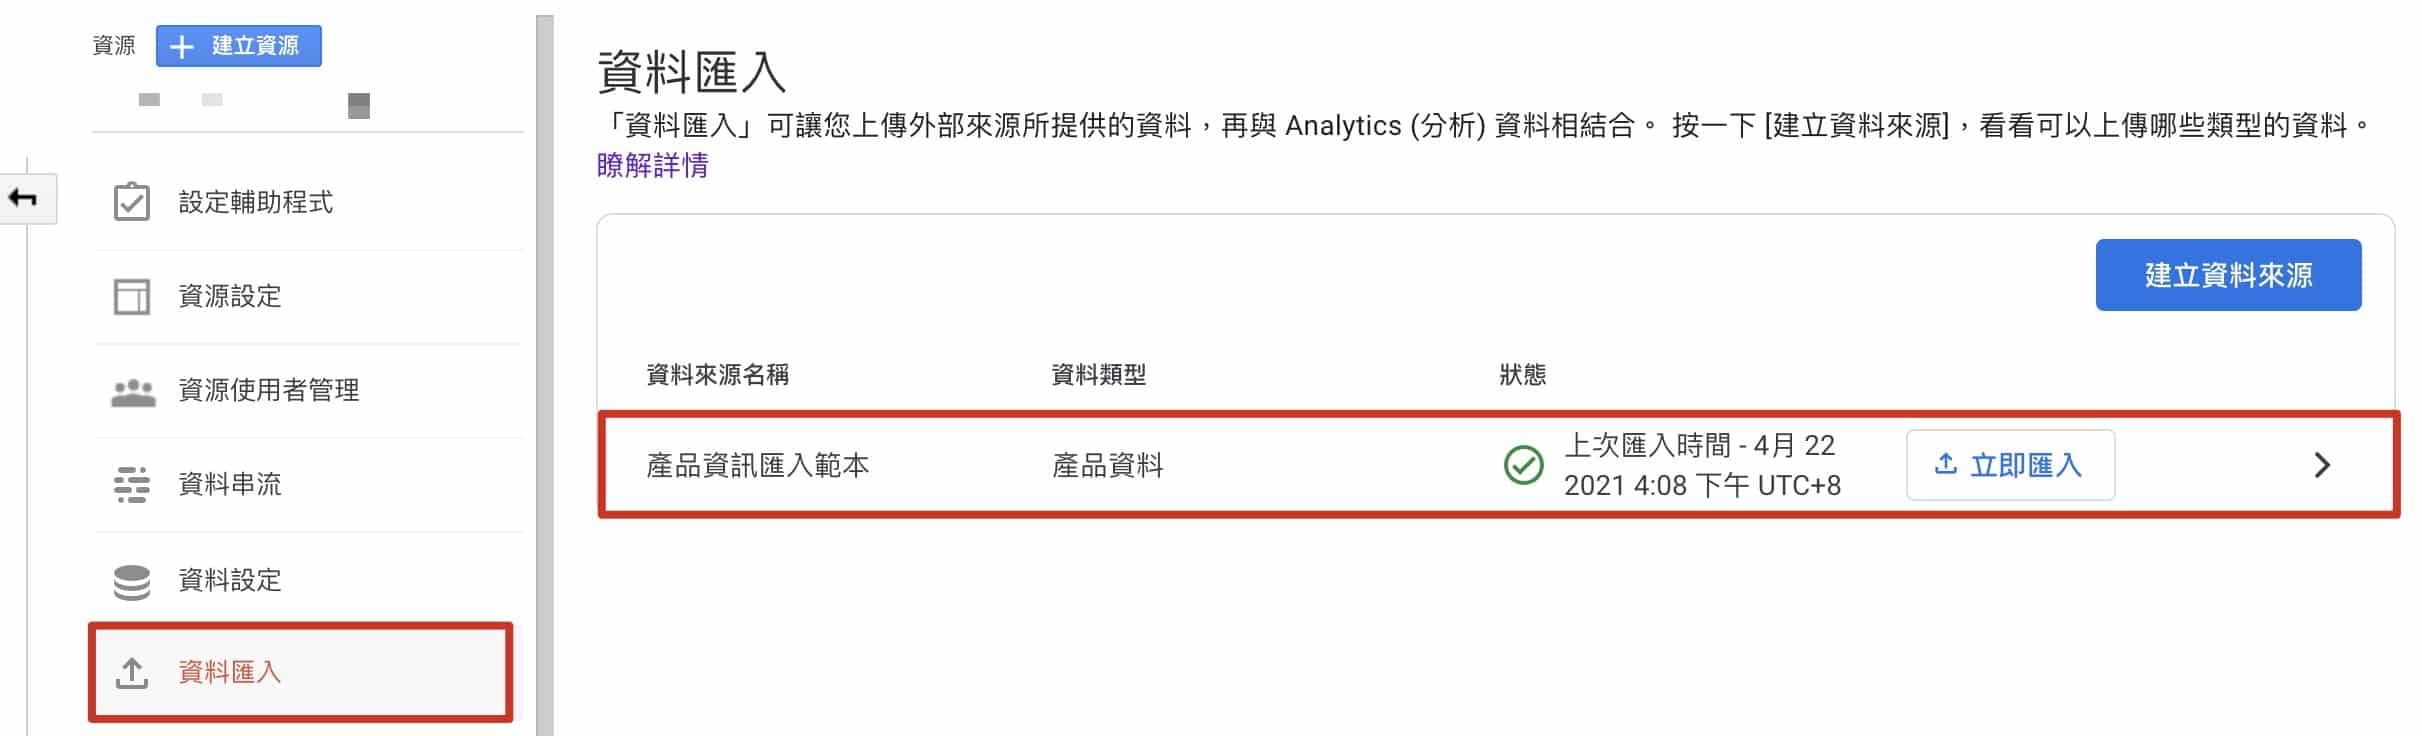 Step5: 確認 GA4 資料匯入 狀態